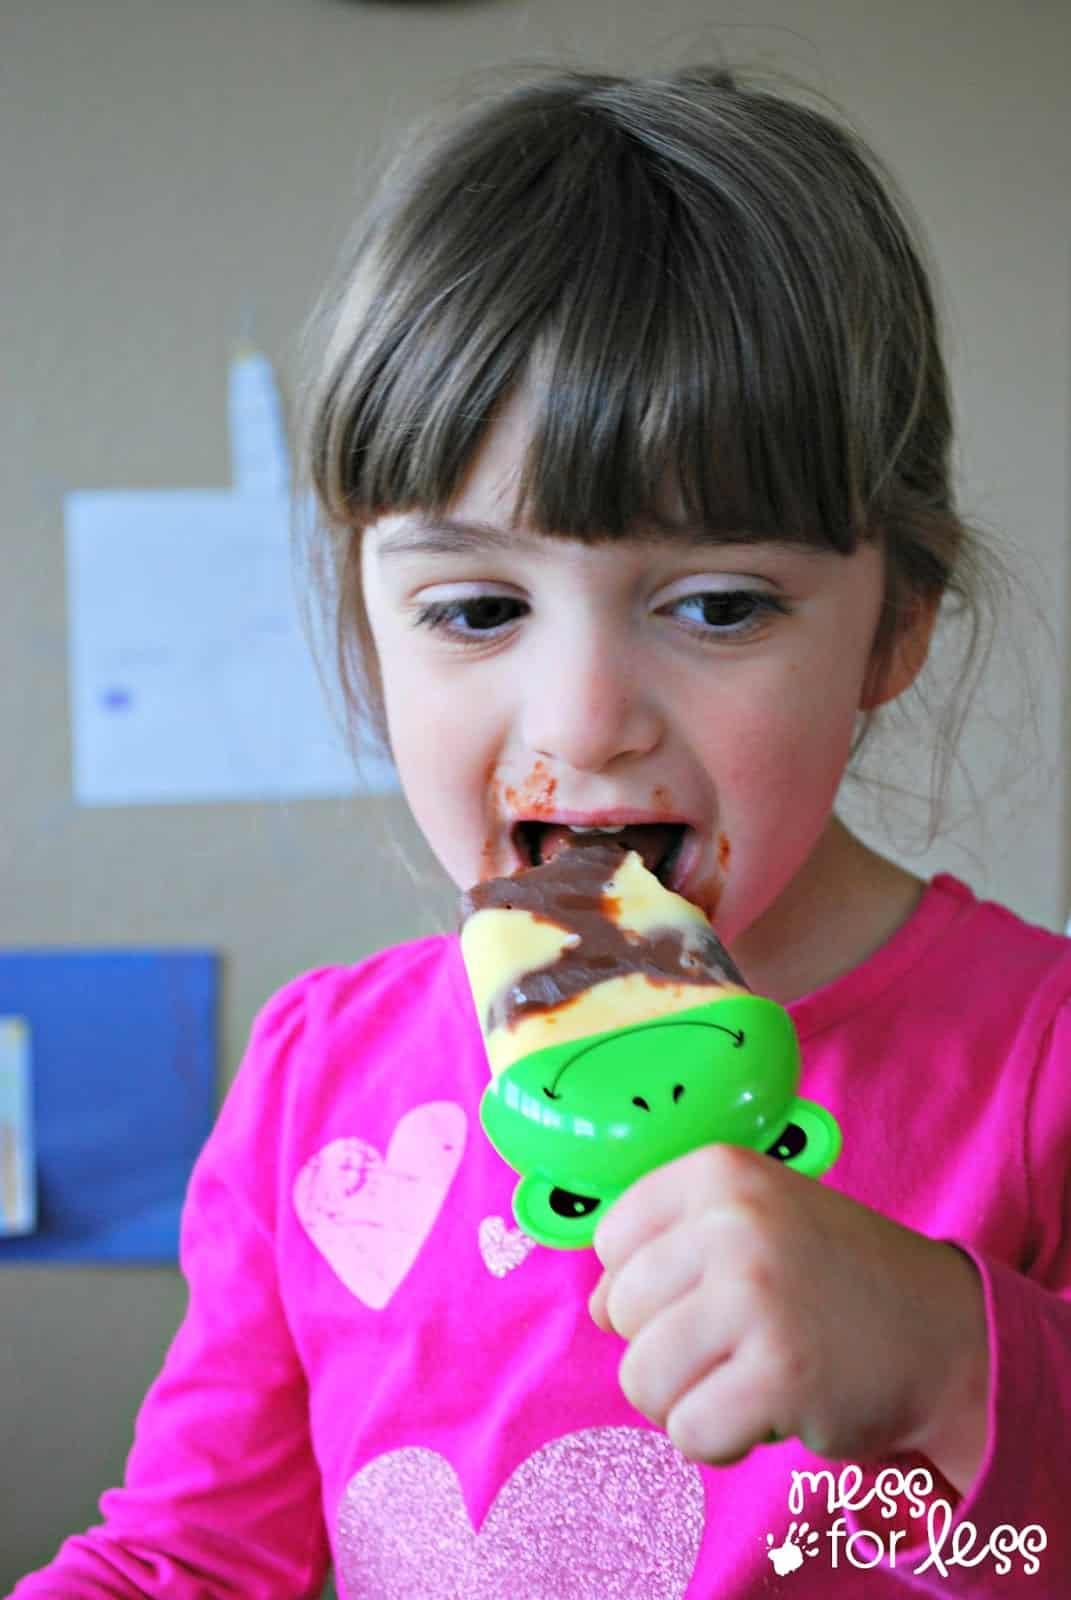 Pudding pop recipe #showusyourmess #PMedia #ad